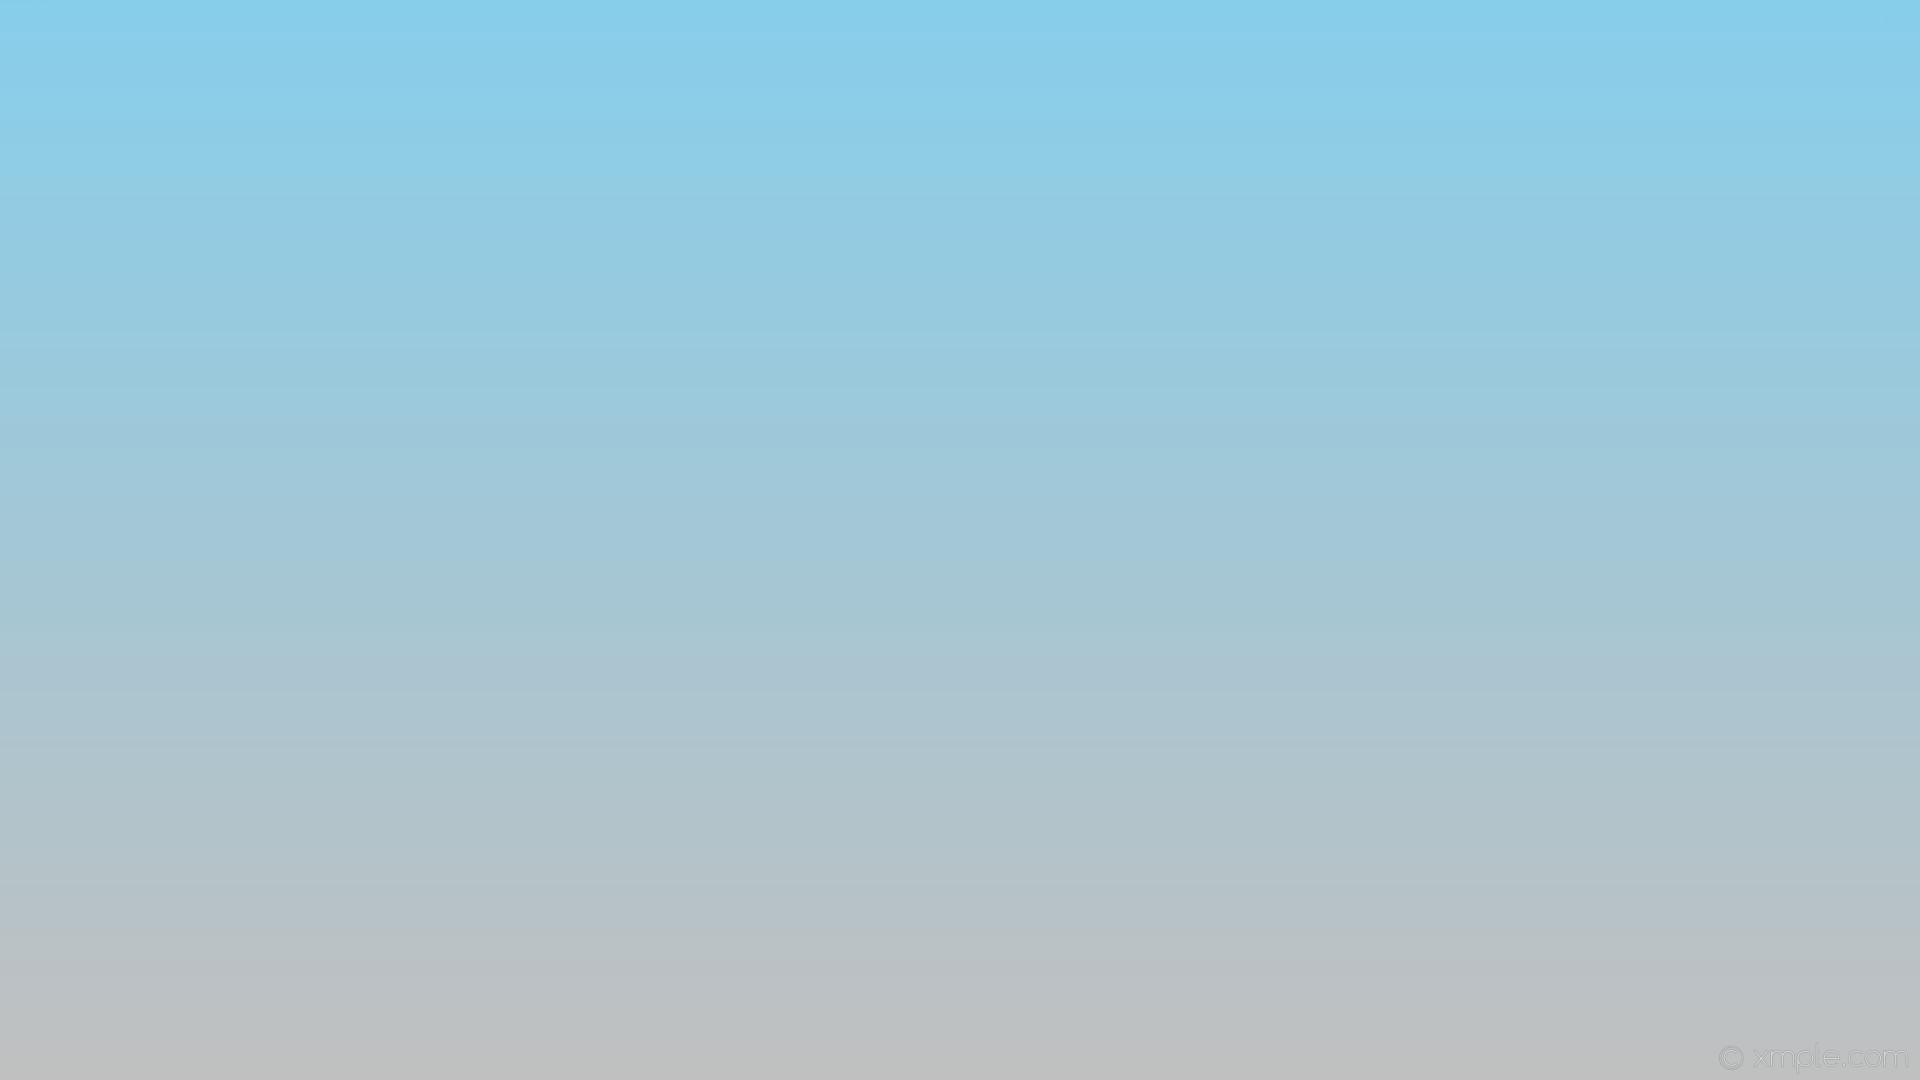 wallpaper blue grey gradient linear sky blue silver #87ceeb #c0c0c0 90°